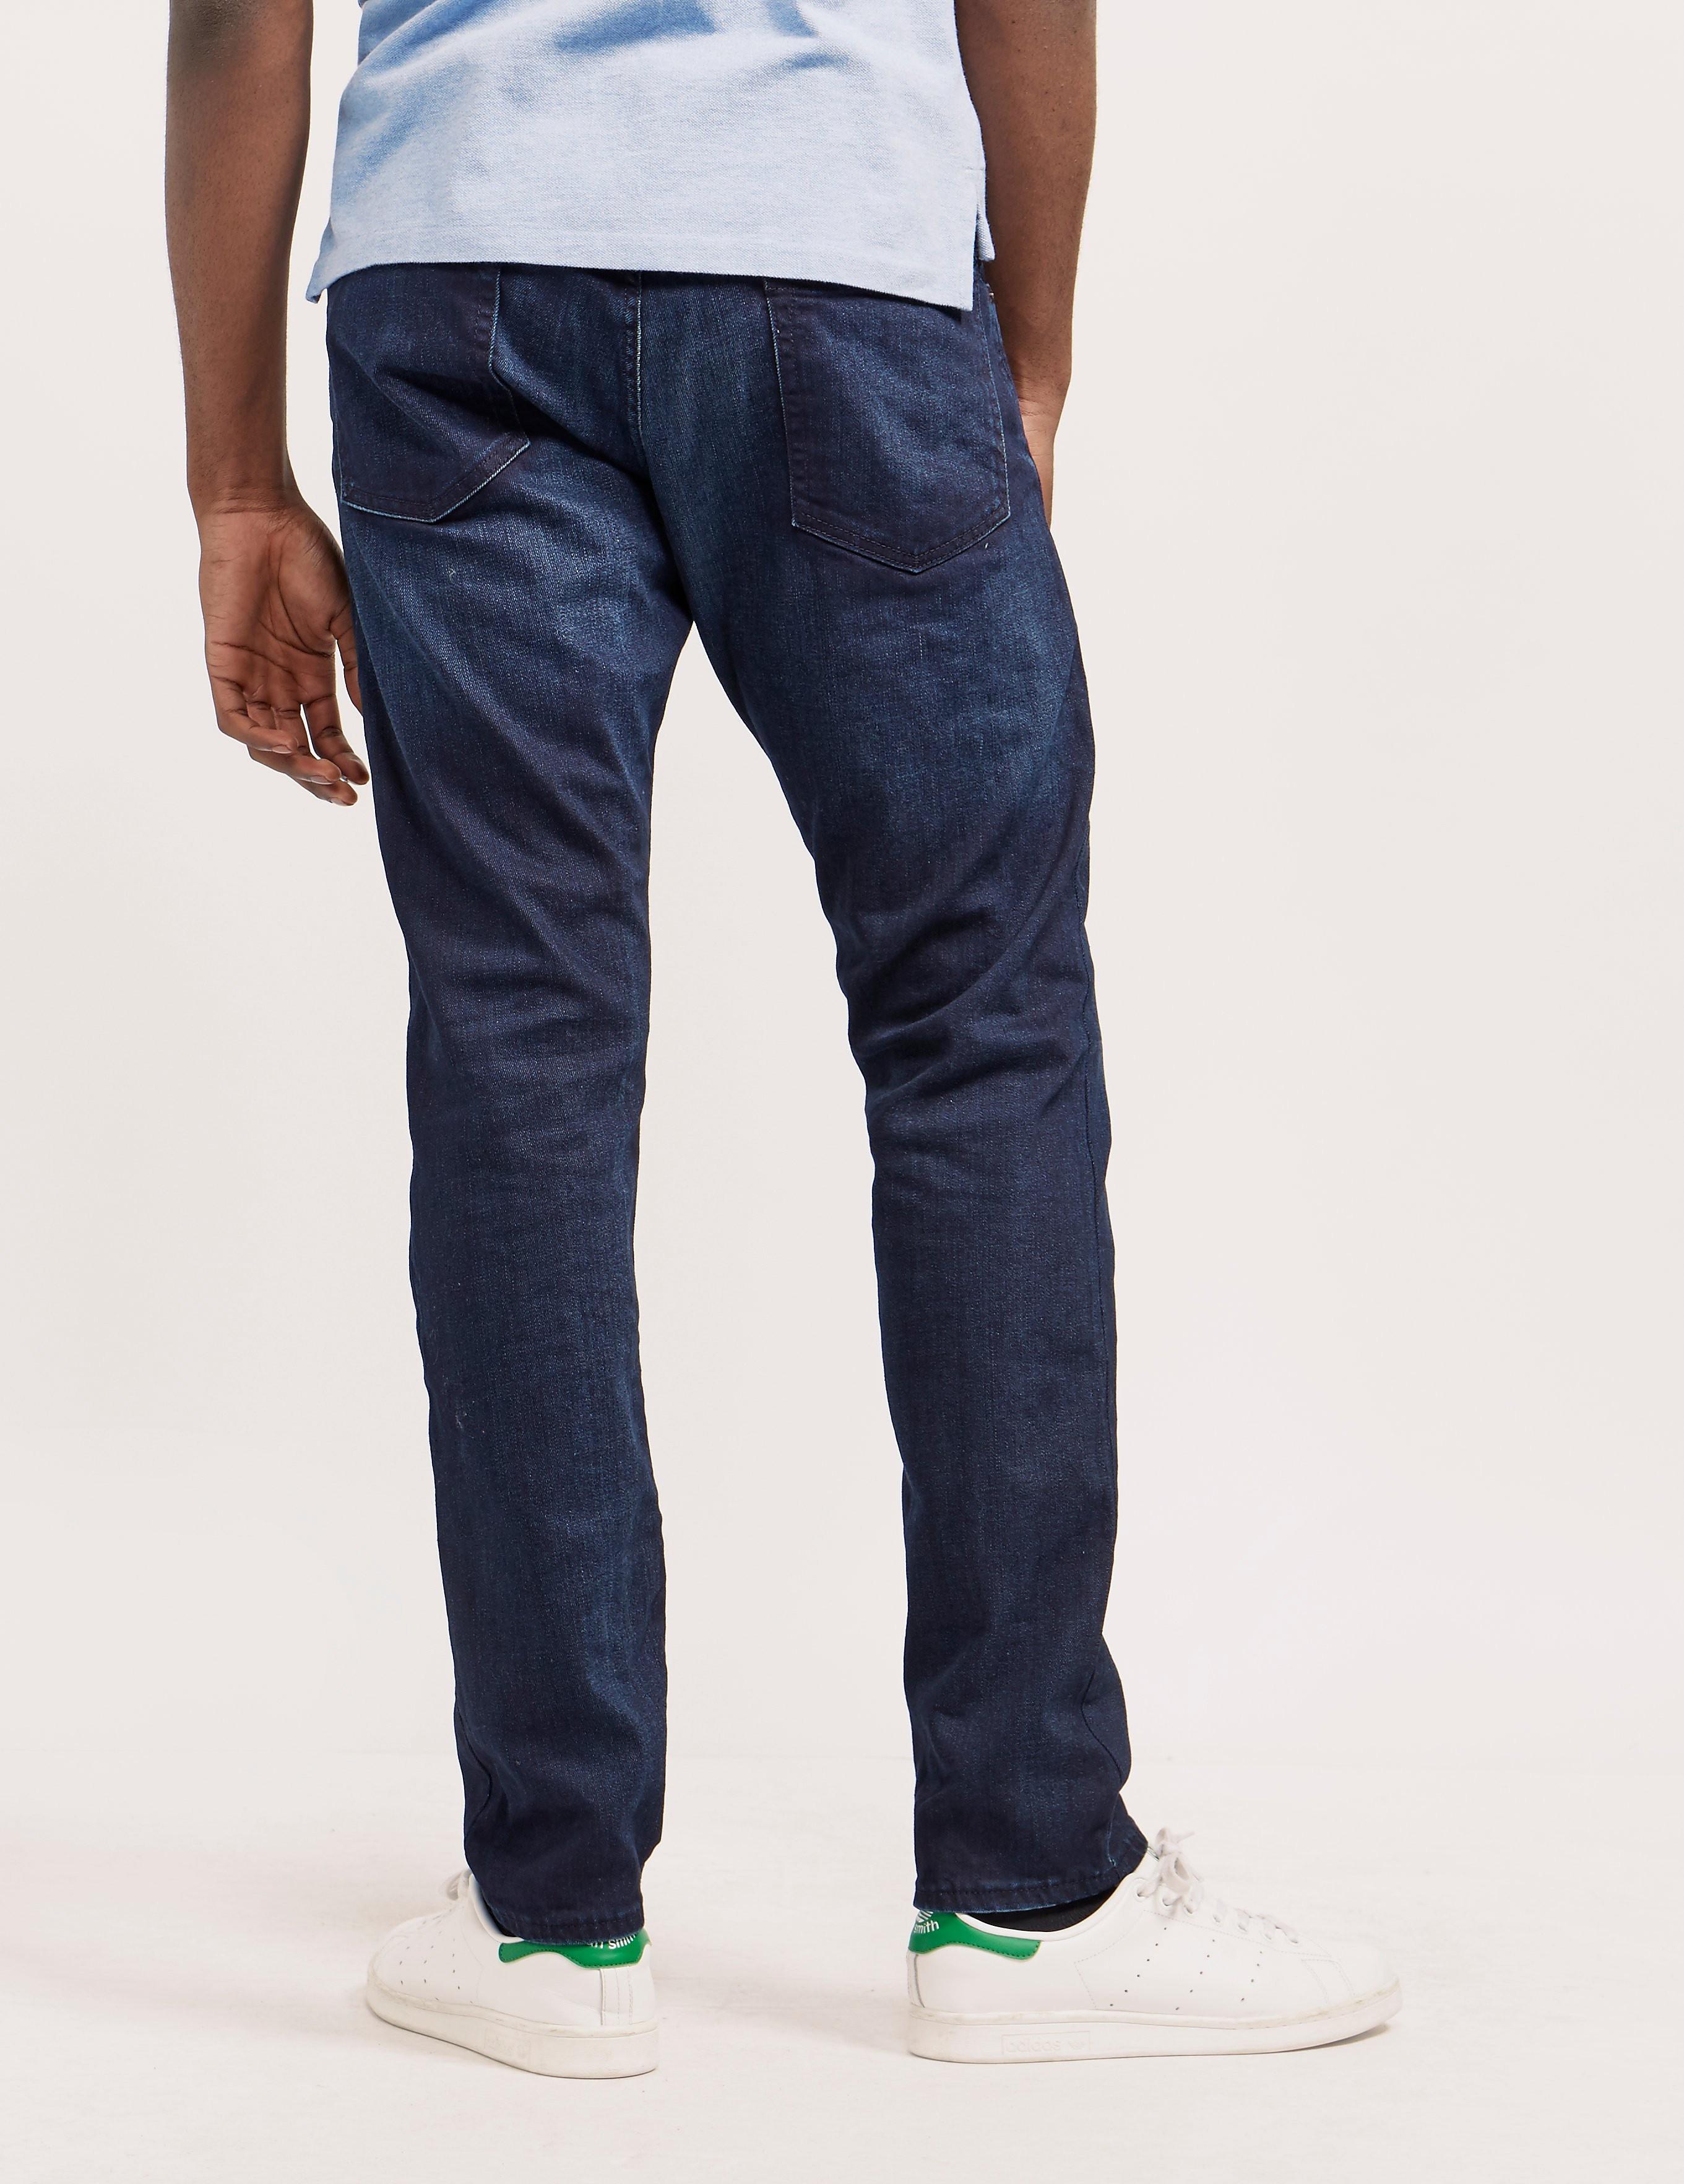 Polo Ralph Lauren SF Jones Jeans